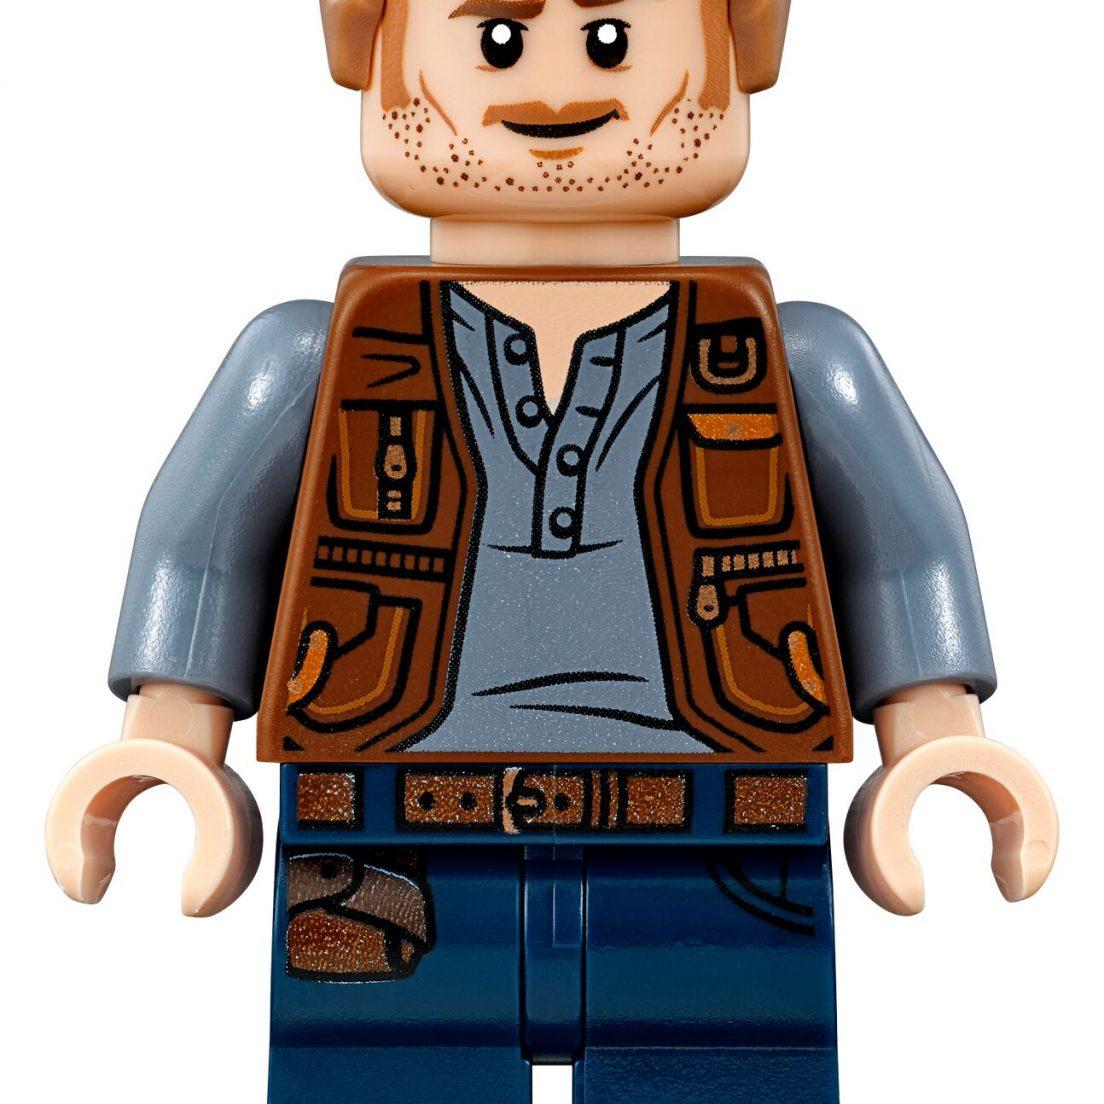 LEGO Jurassic World 75926 Pteranodon Chase - Owen